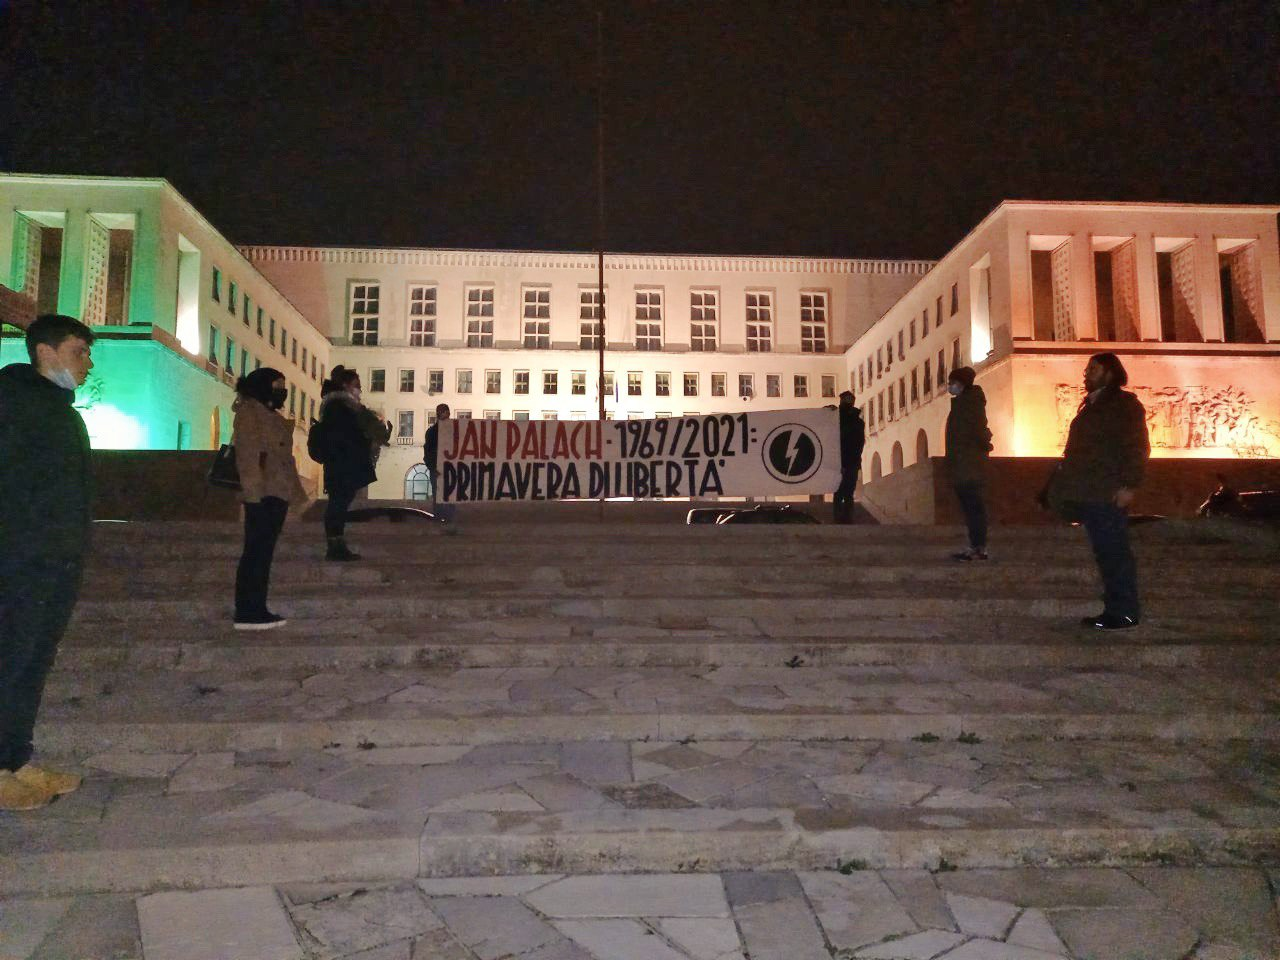 blocco studentesco trieste 19 gennaio jan palach primavera di liberta